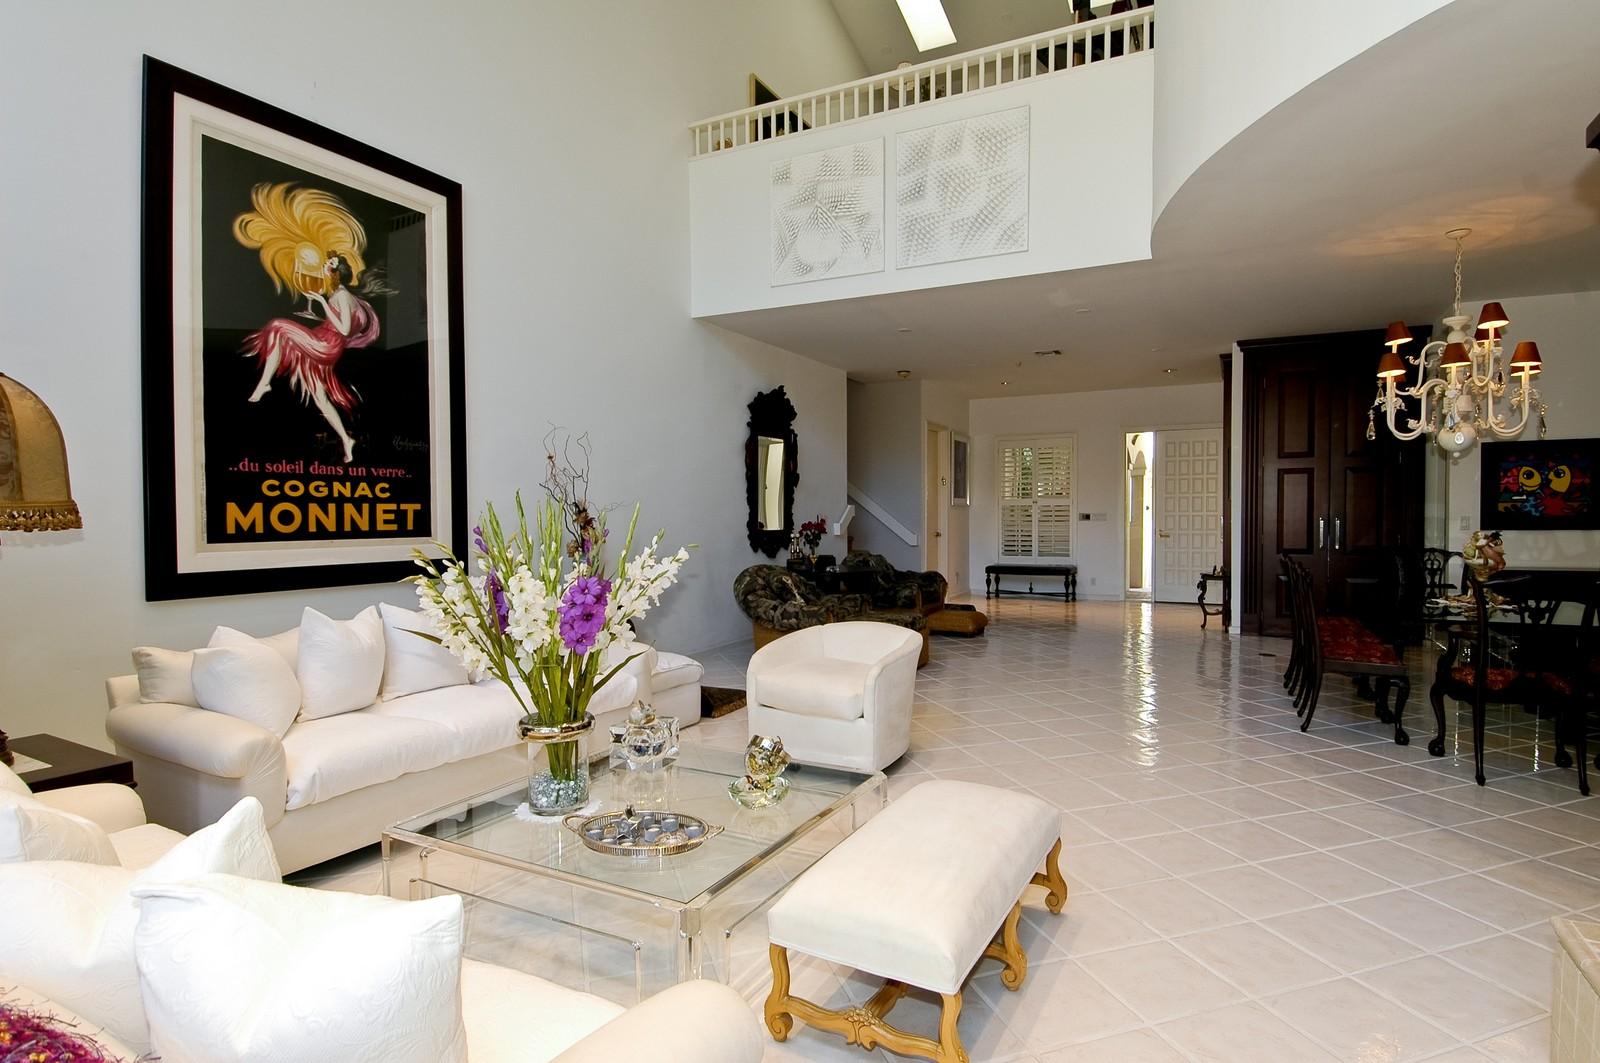 Real Estate Photography - 3685 NE 195 Ter, Aventura, FL, 33180 - Living Room / Dining Room